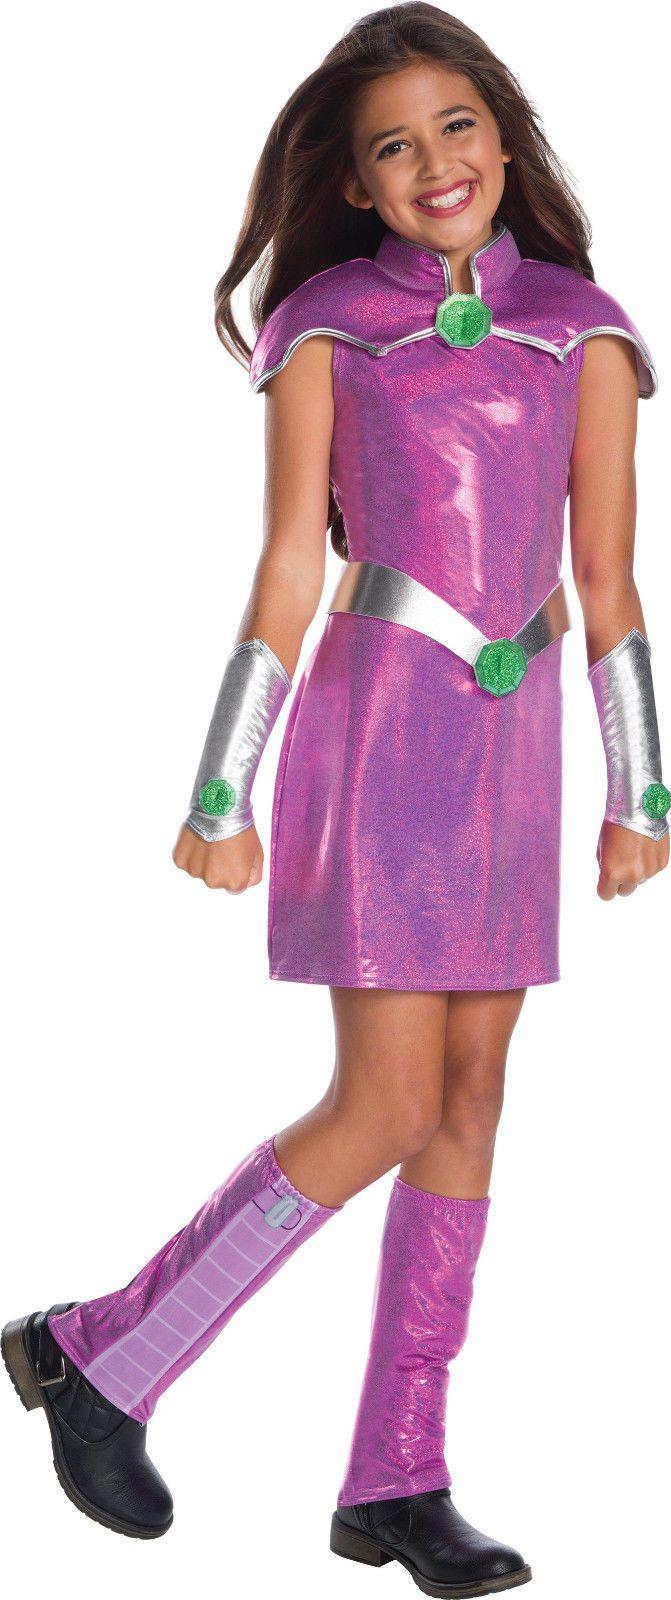 Kids Costumes: Child Starfire Dc Superhero Costume  U003e BUY IT NOW ONLY:  $34.95 On EBay!